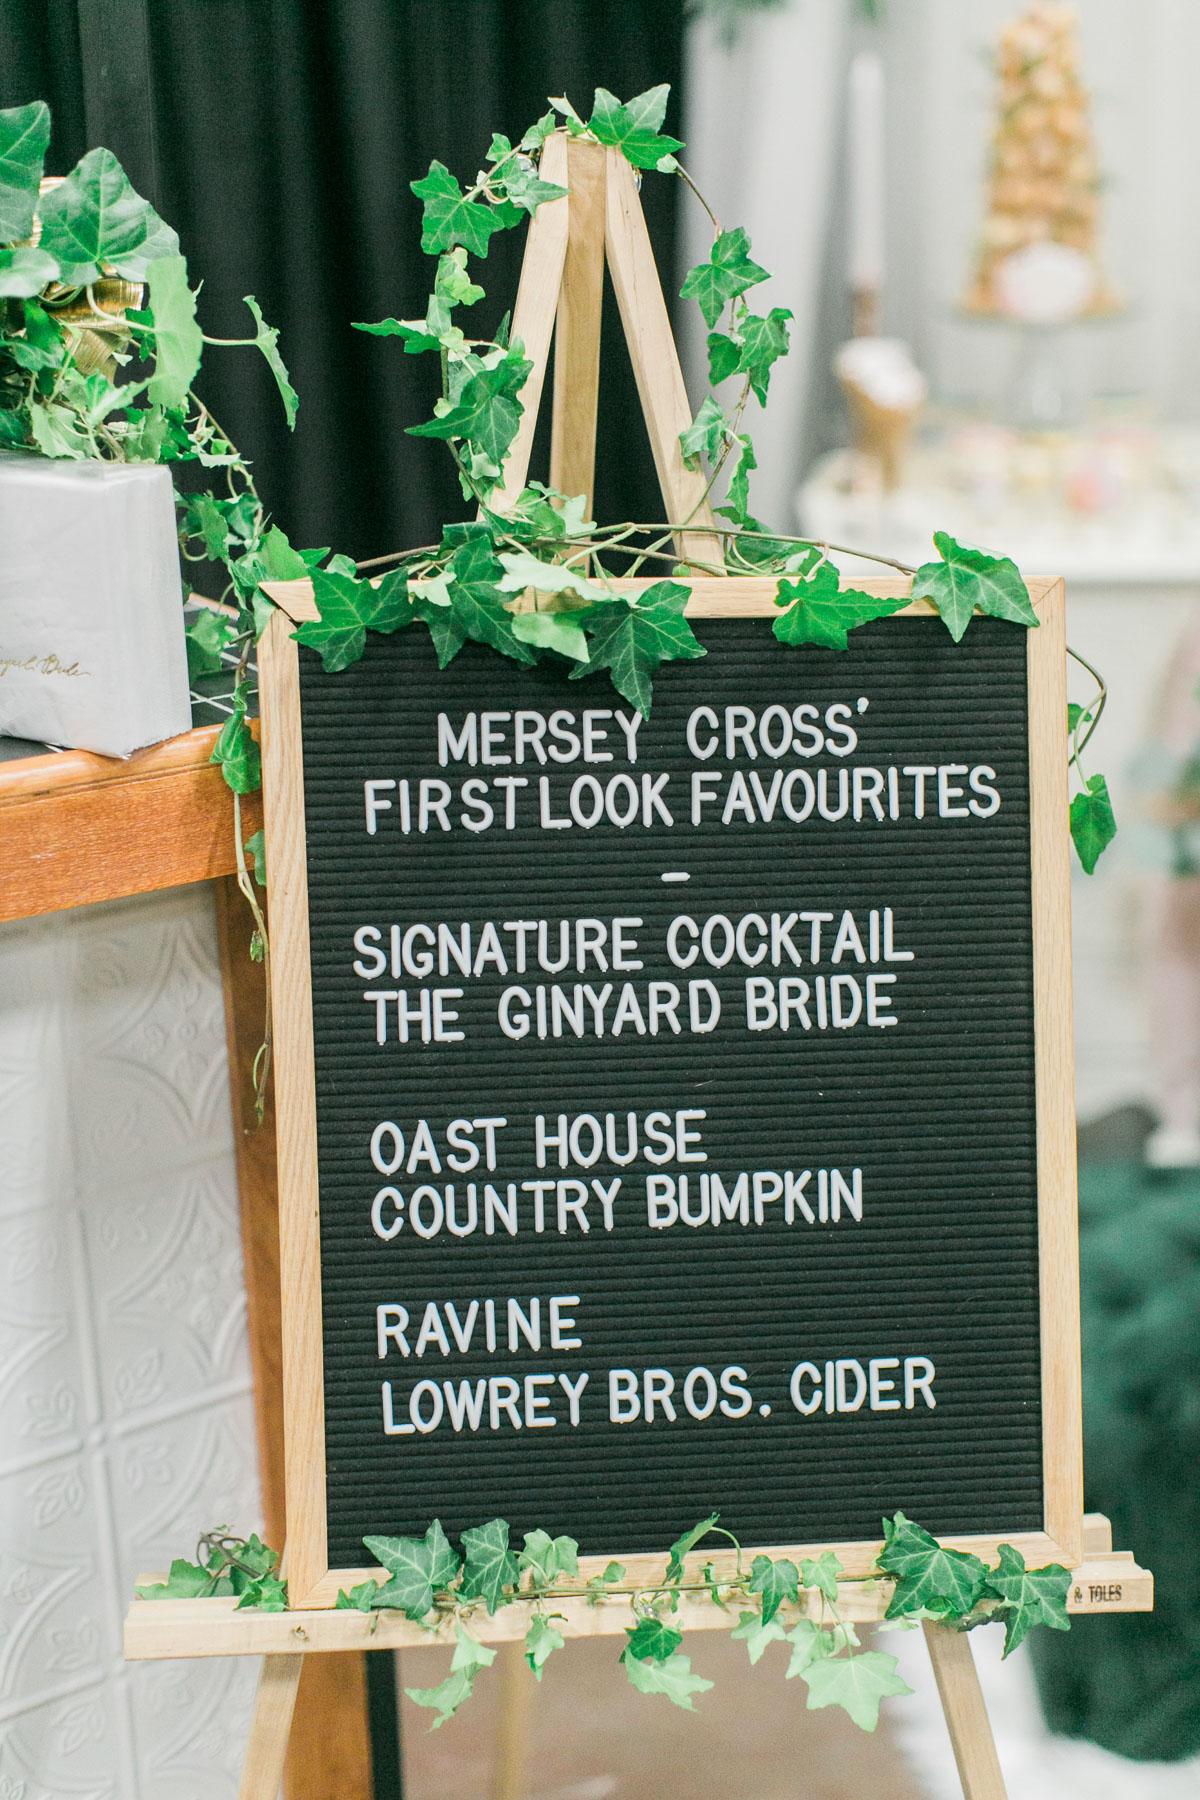 mersey-cross-vineyard-bride-swish-list-the hare wine co-niagara-on-the-lake-first-look-autumn-2.jpg